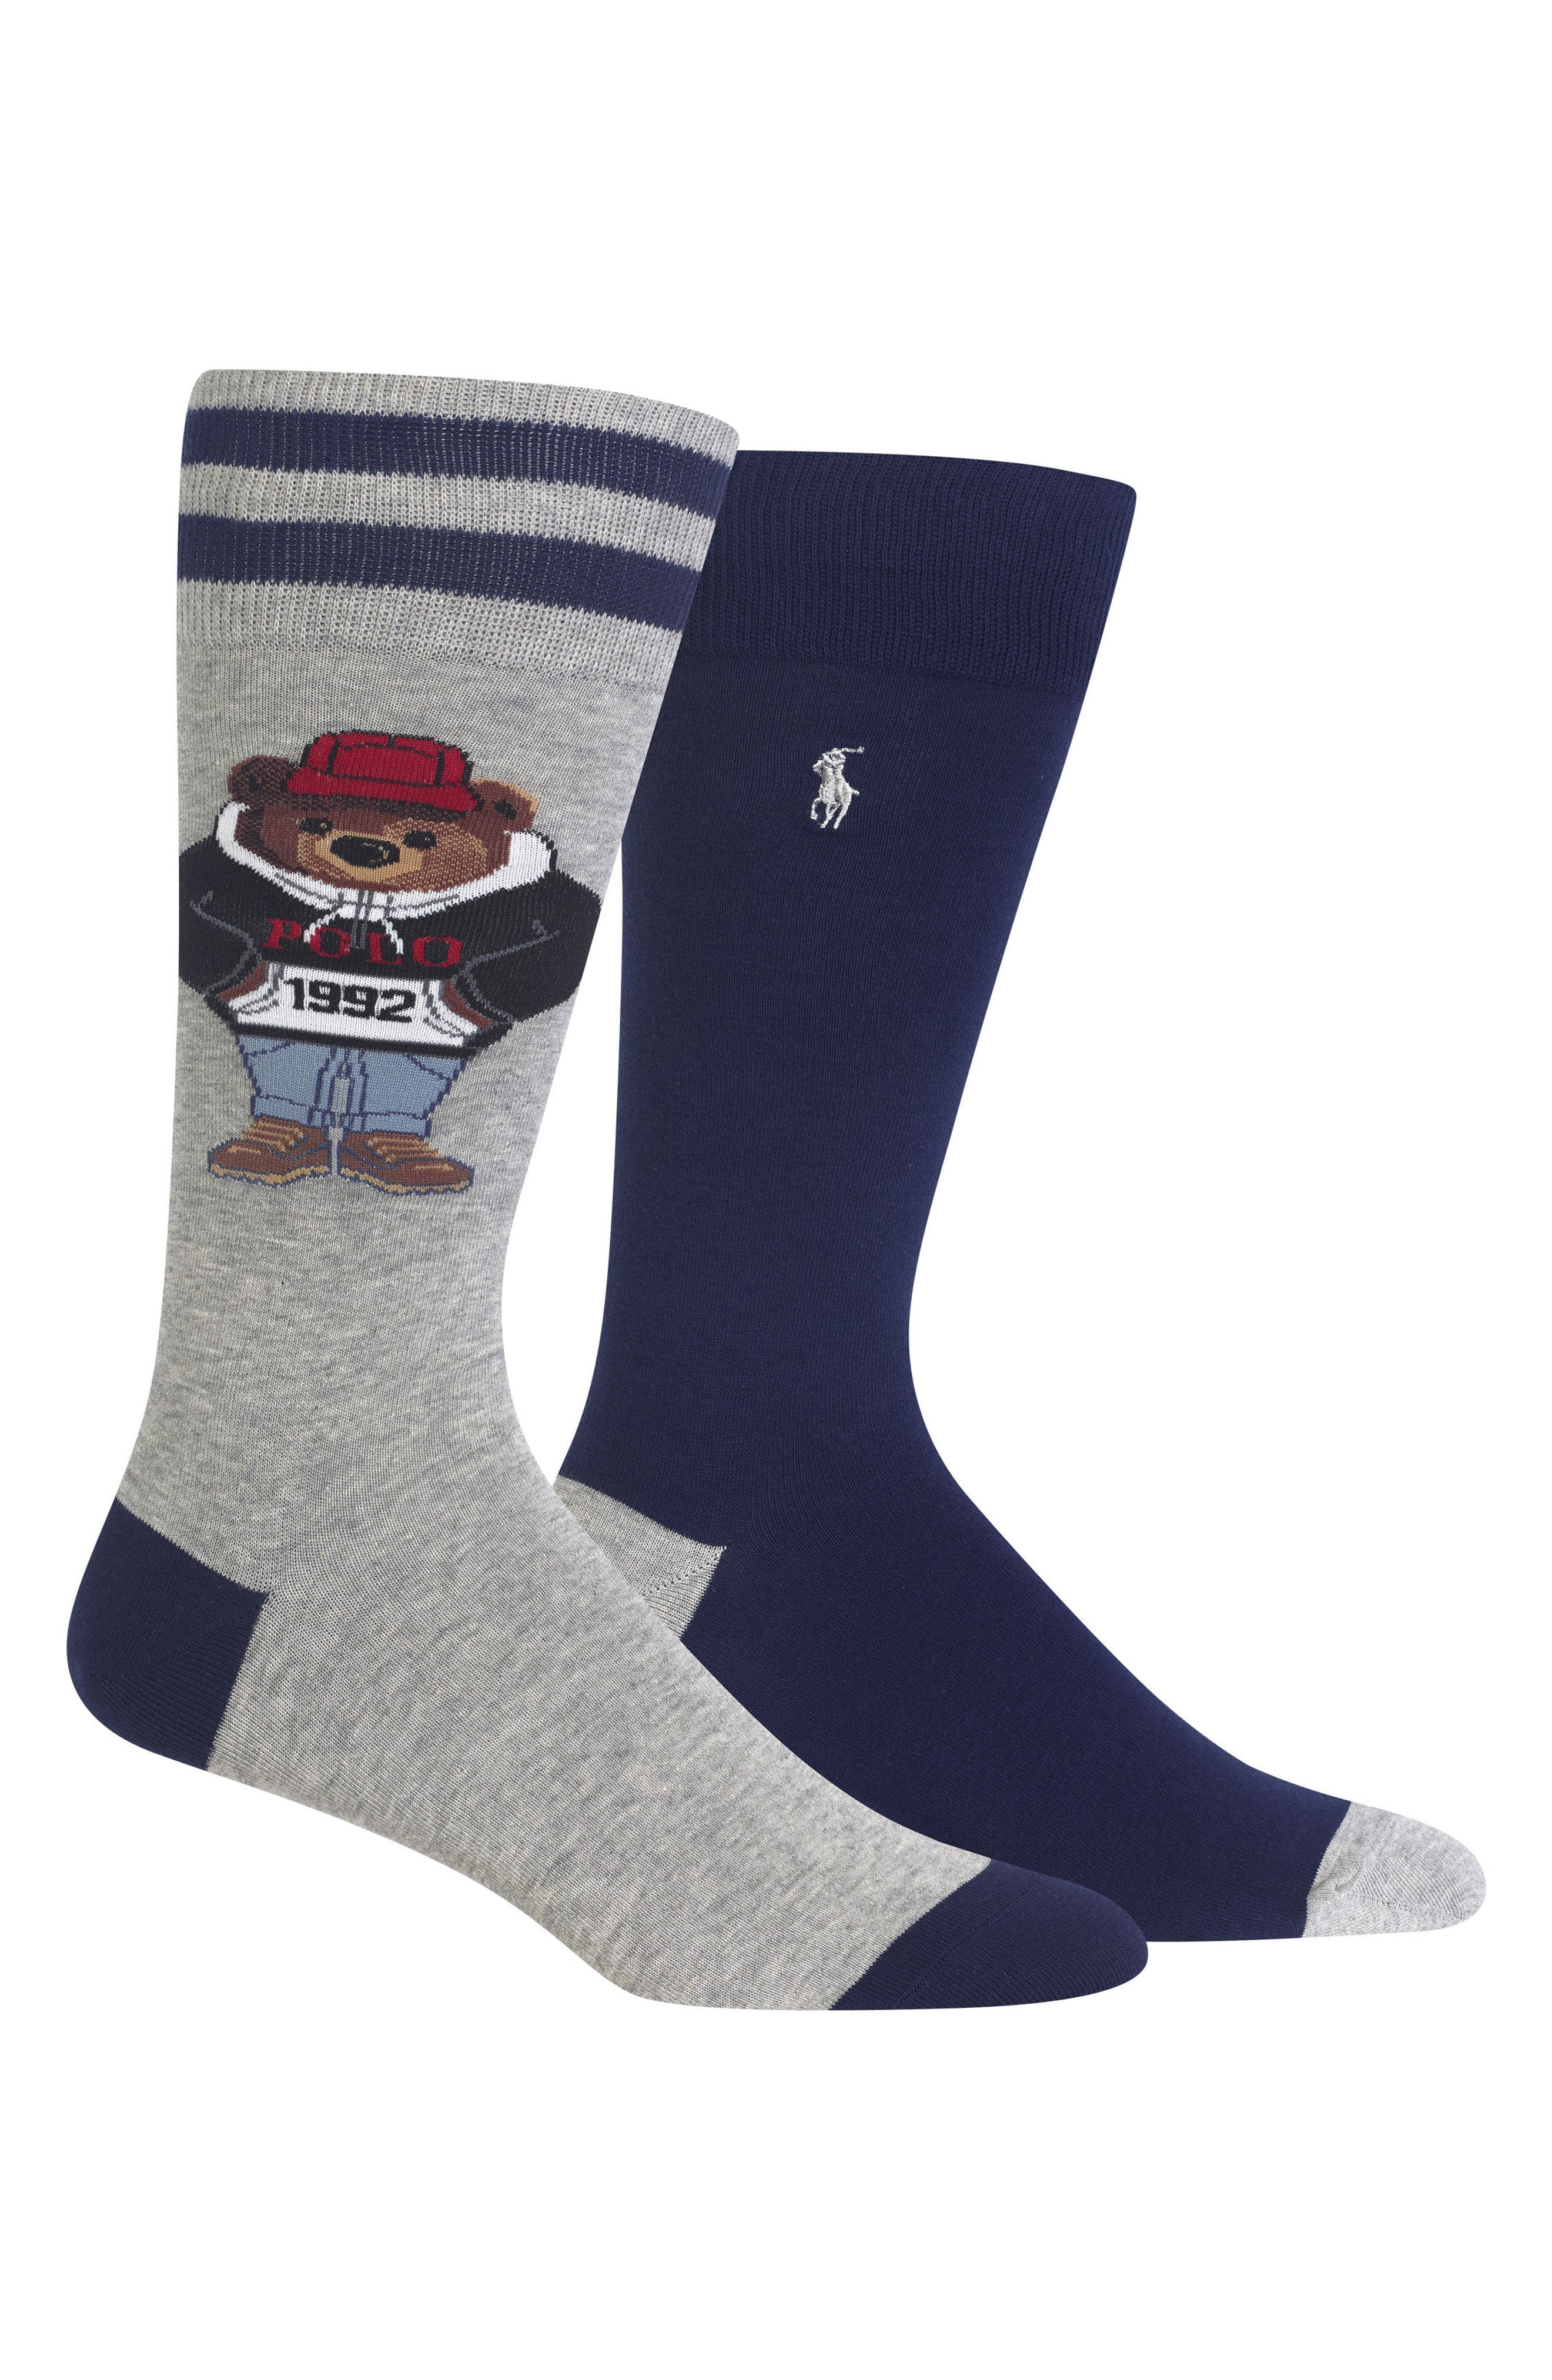 2-Pack Socks,                         Main,                         color, 054